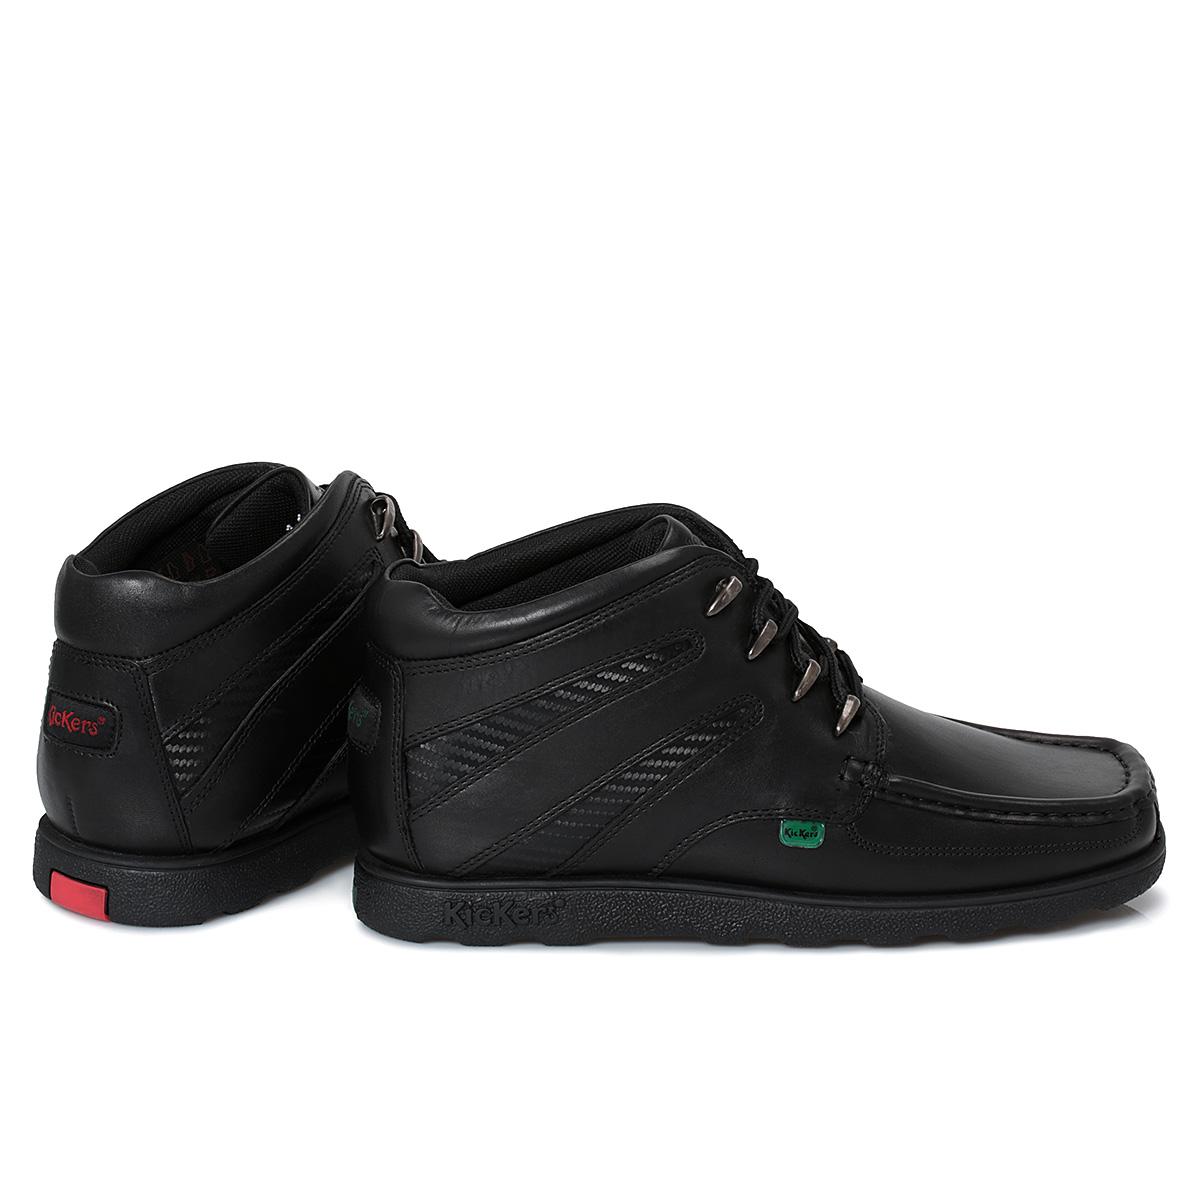 Black kicker sandals - Kickers Black Leather Junior Lace Up Boots Kids School Shoes Size 40 46